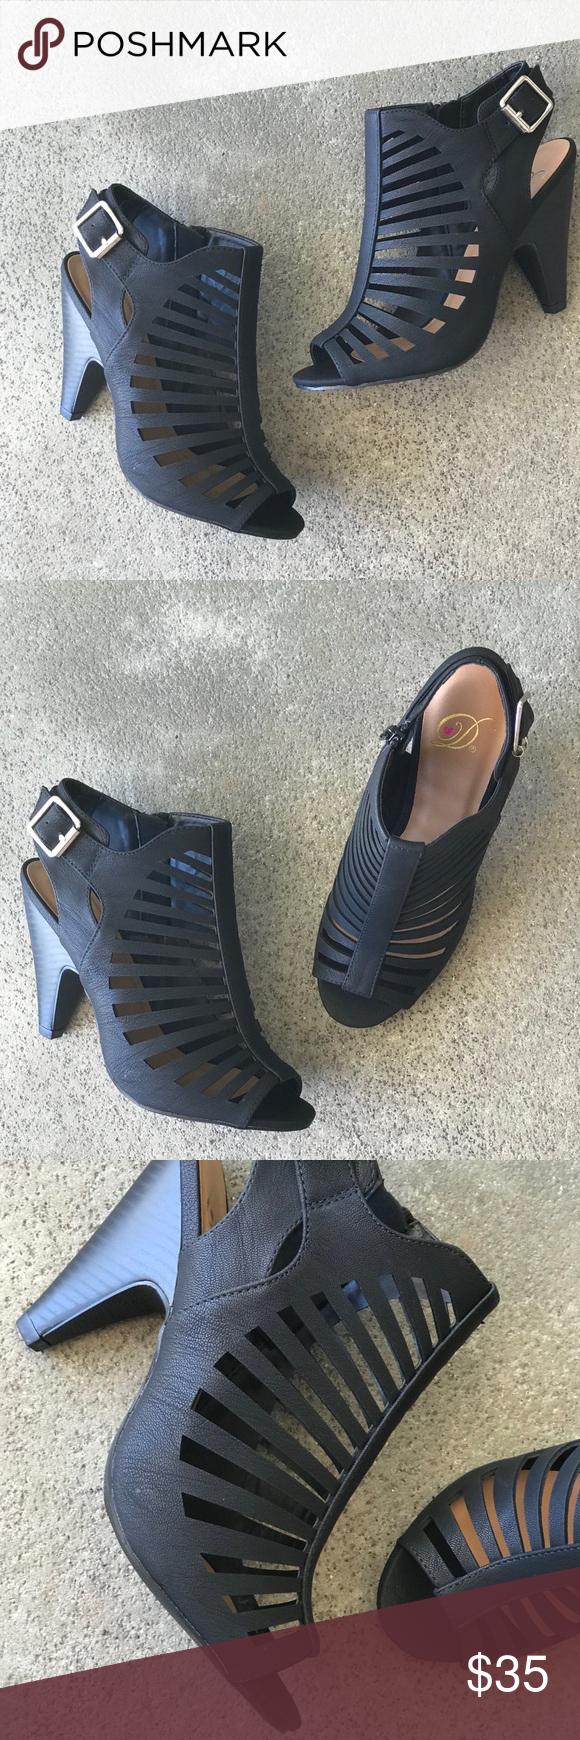 9b5cdcd8367 Delicious strappy Black ebony peep toe cage heel Delicious strappy Black  ebony peep toe cage heel